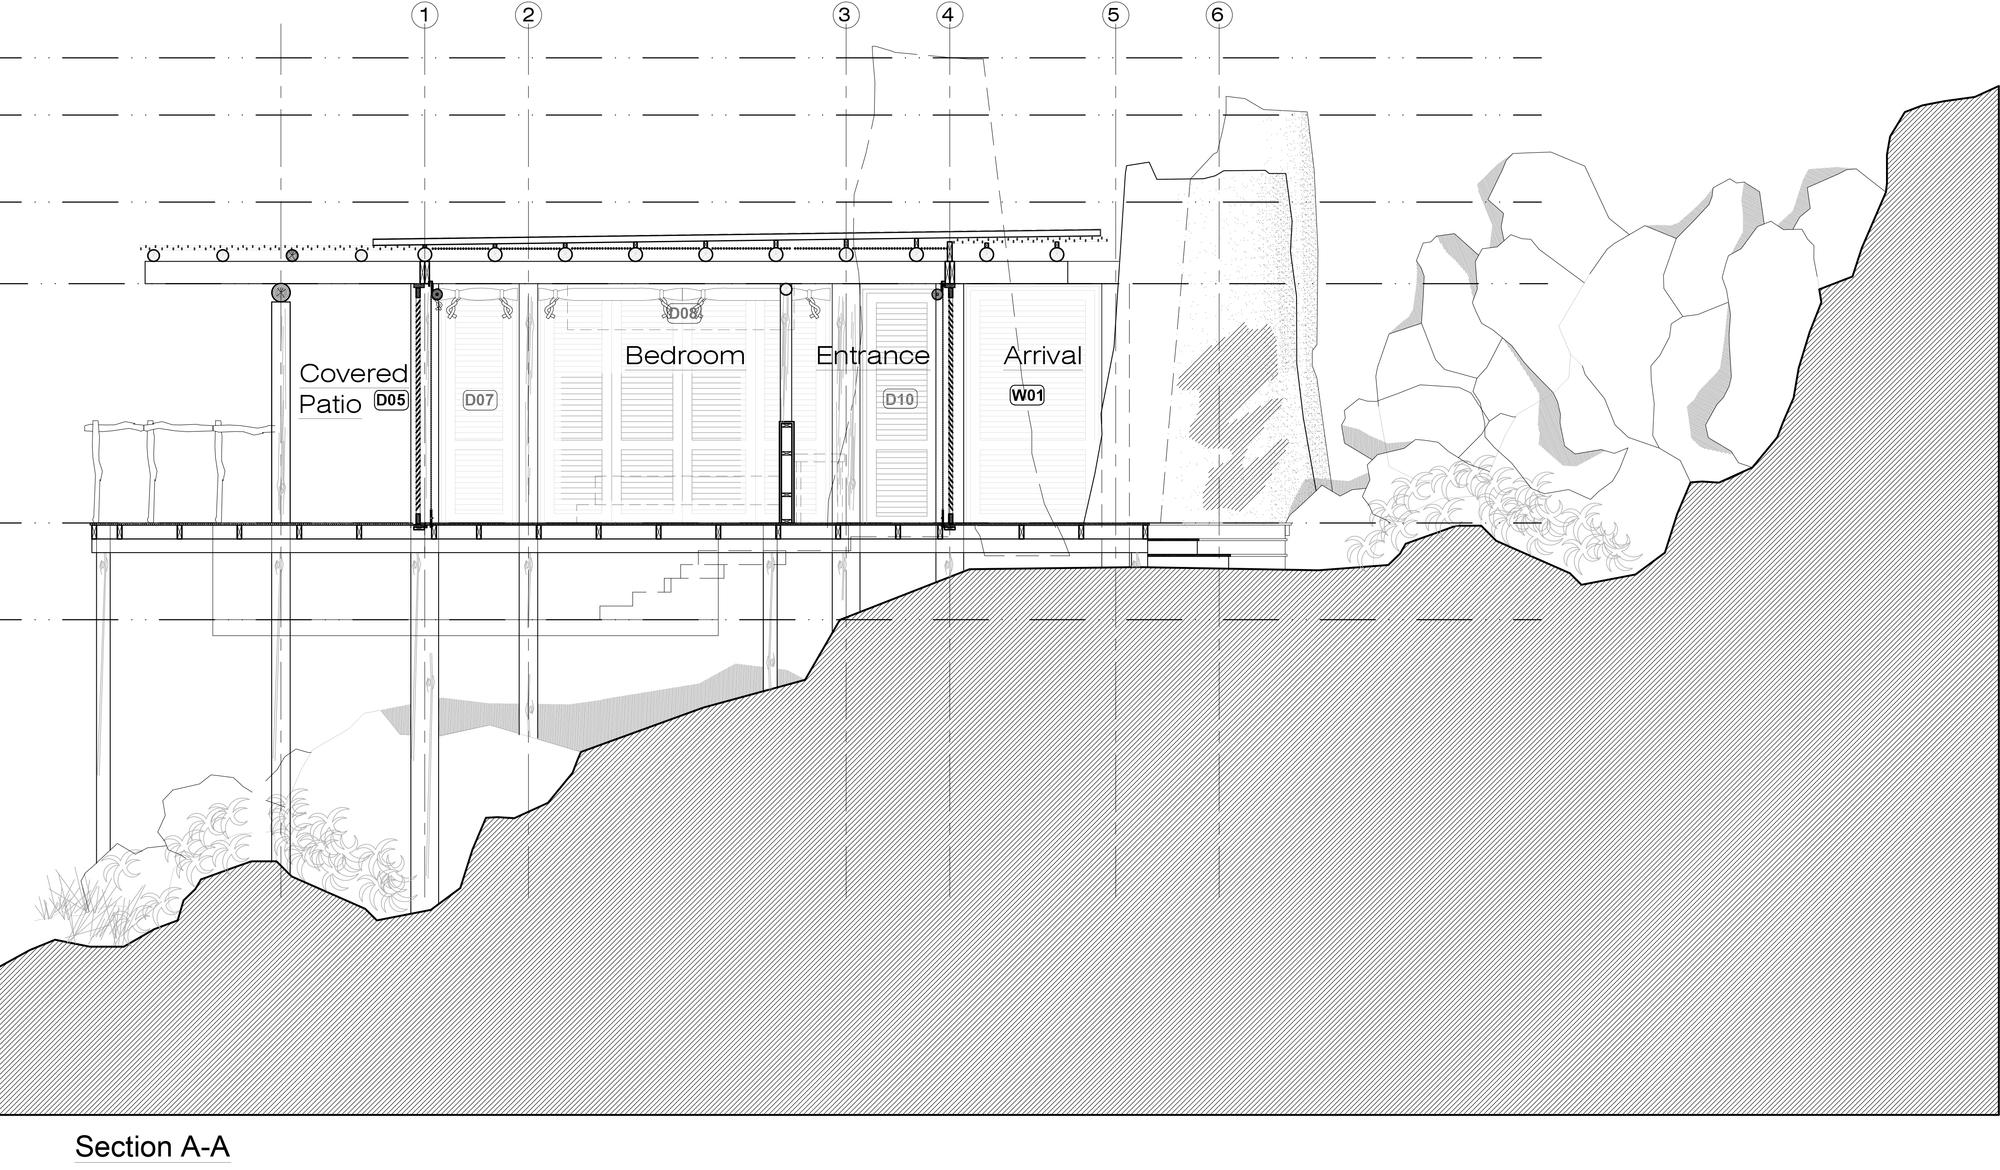 Sectional-plan-of-Jabali-Ridge-Lodge-designed-by-Nicholas-Plewman-Architects